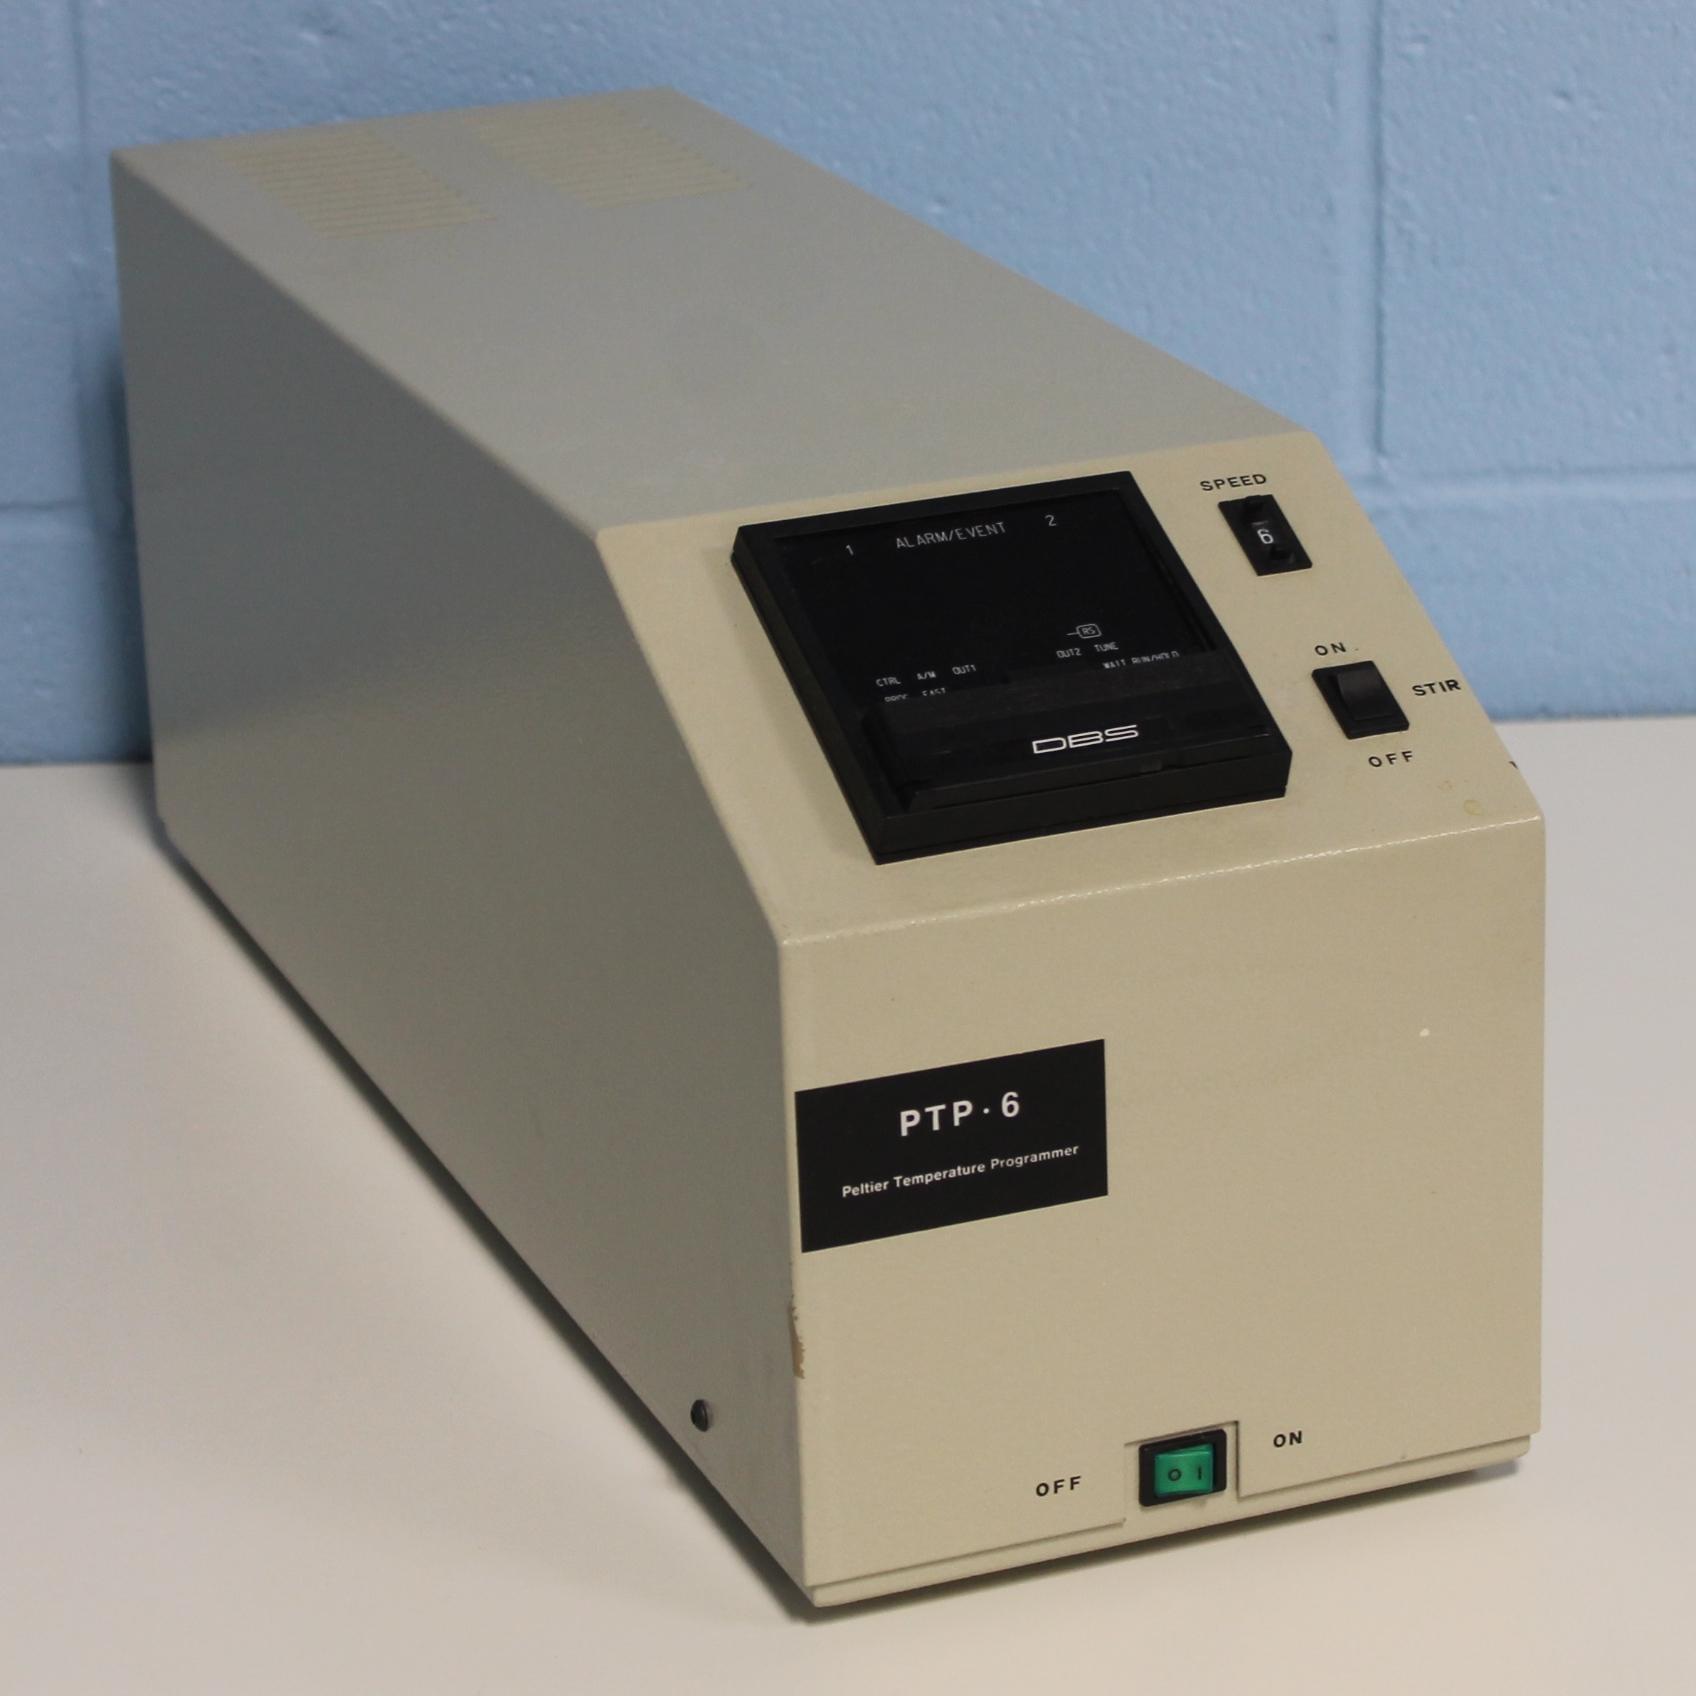 PerkinElmer D.B.S PTP-6 Peltier Temperature Programmer Image